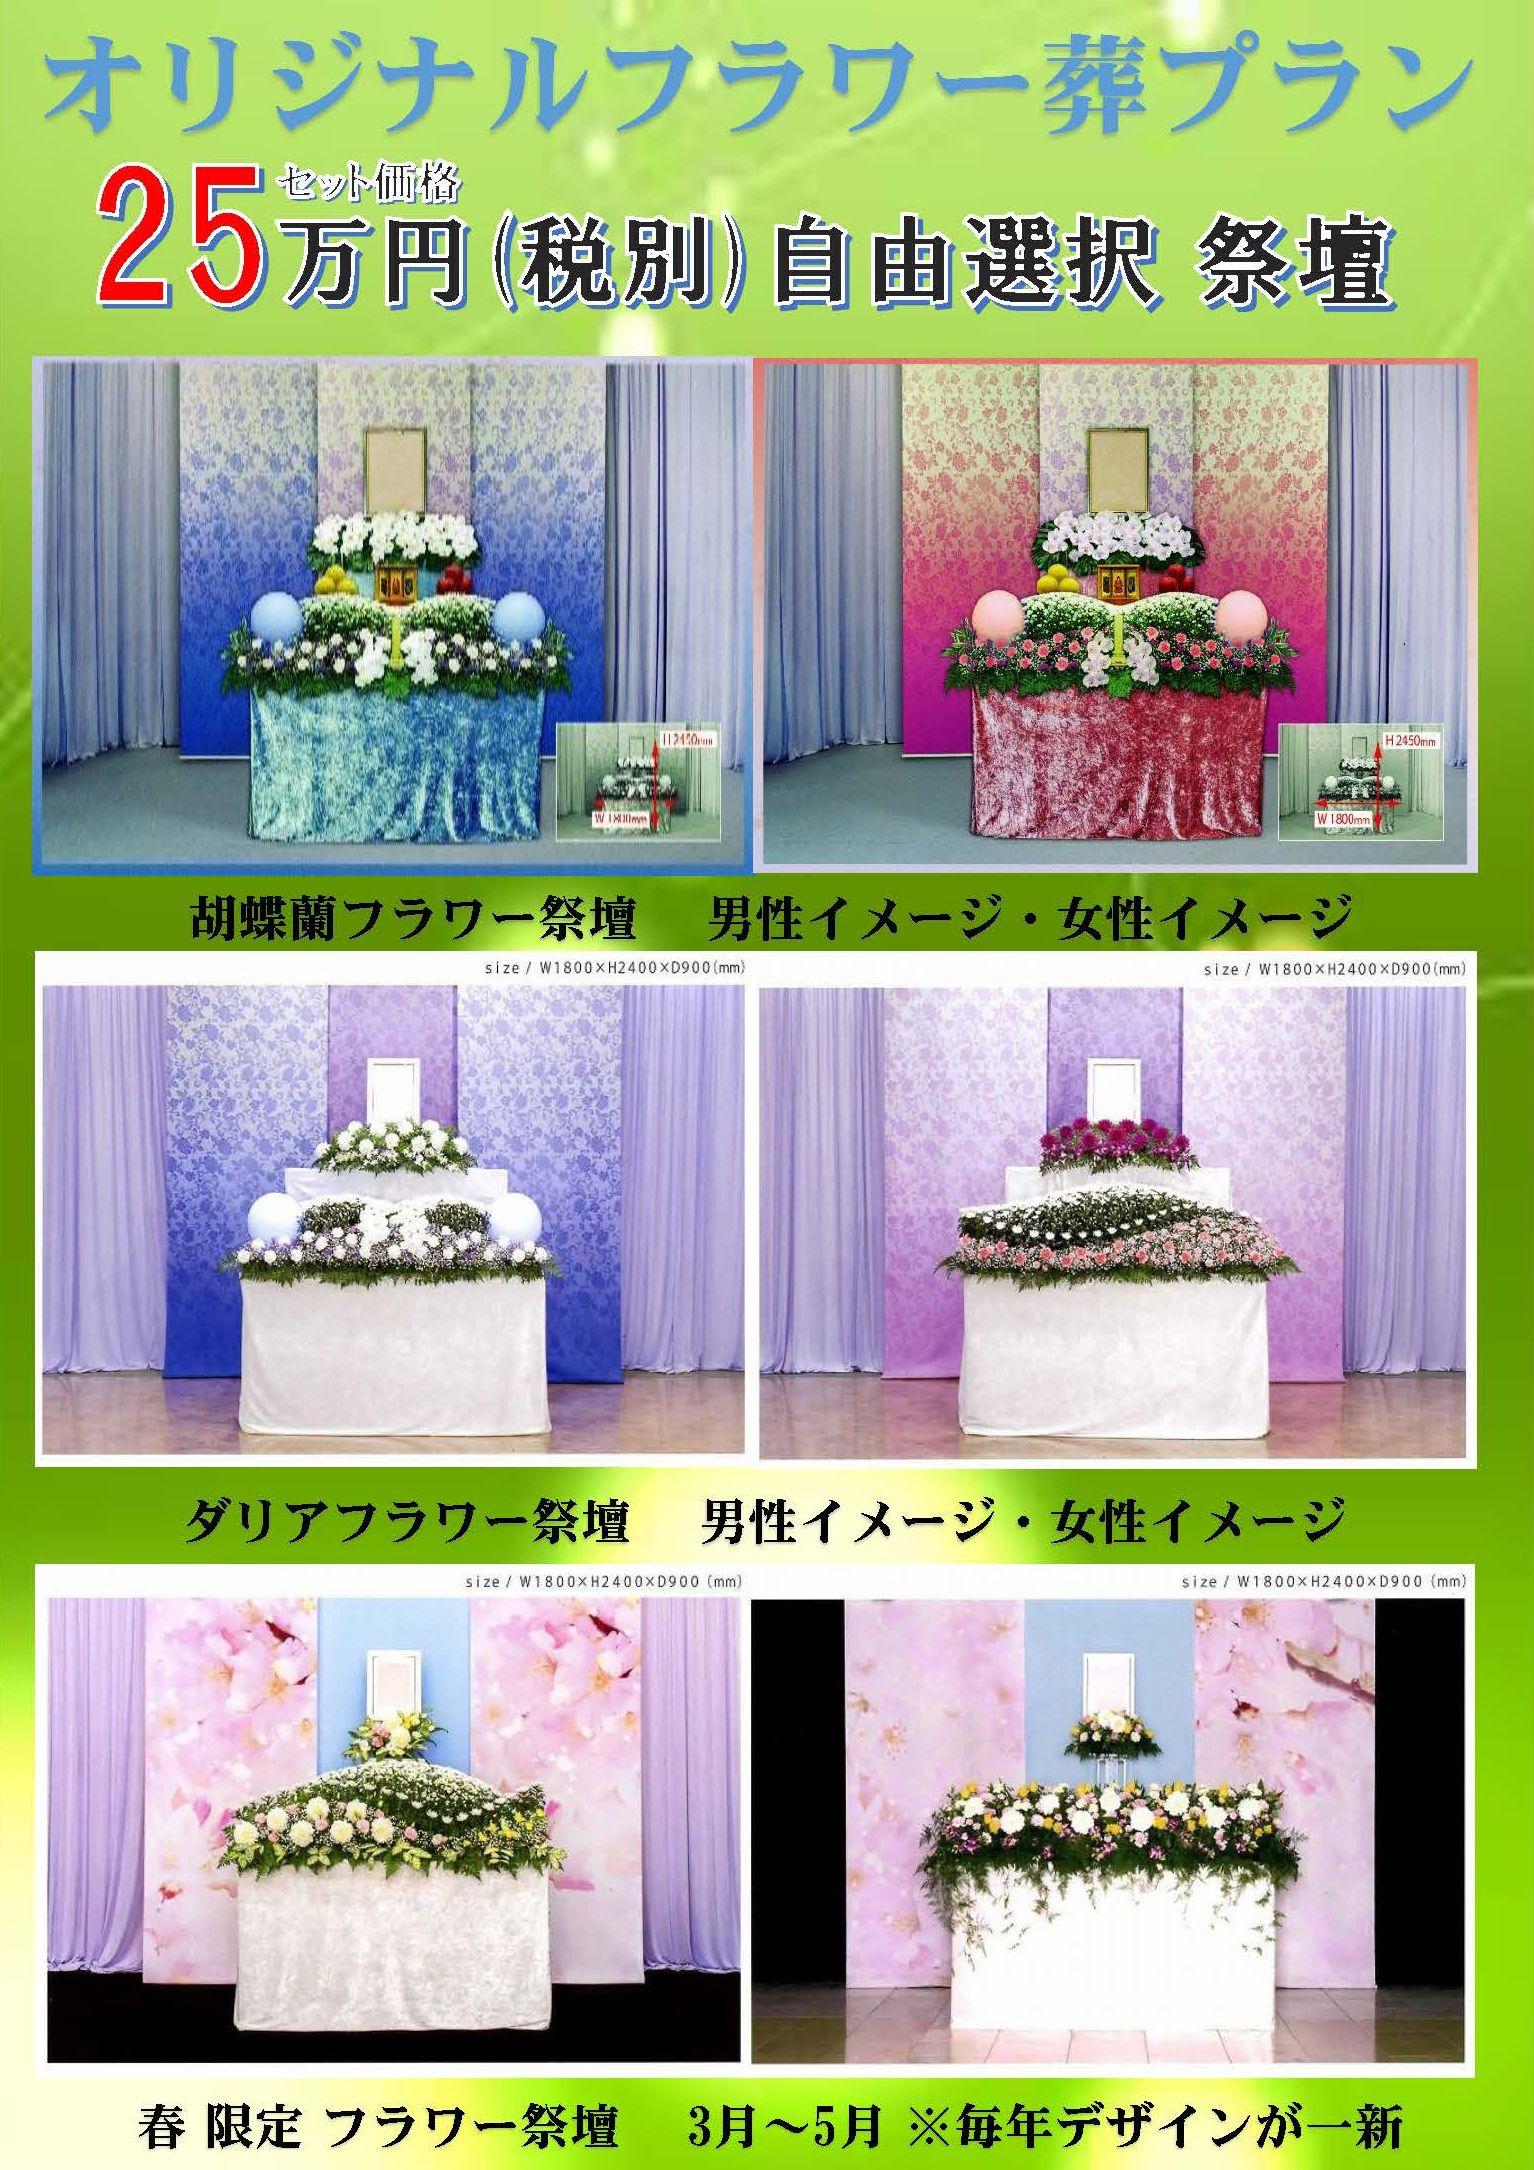 自由選択祭壇 25万円_ページ_1